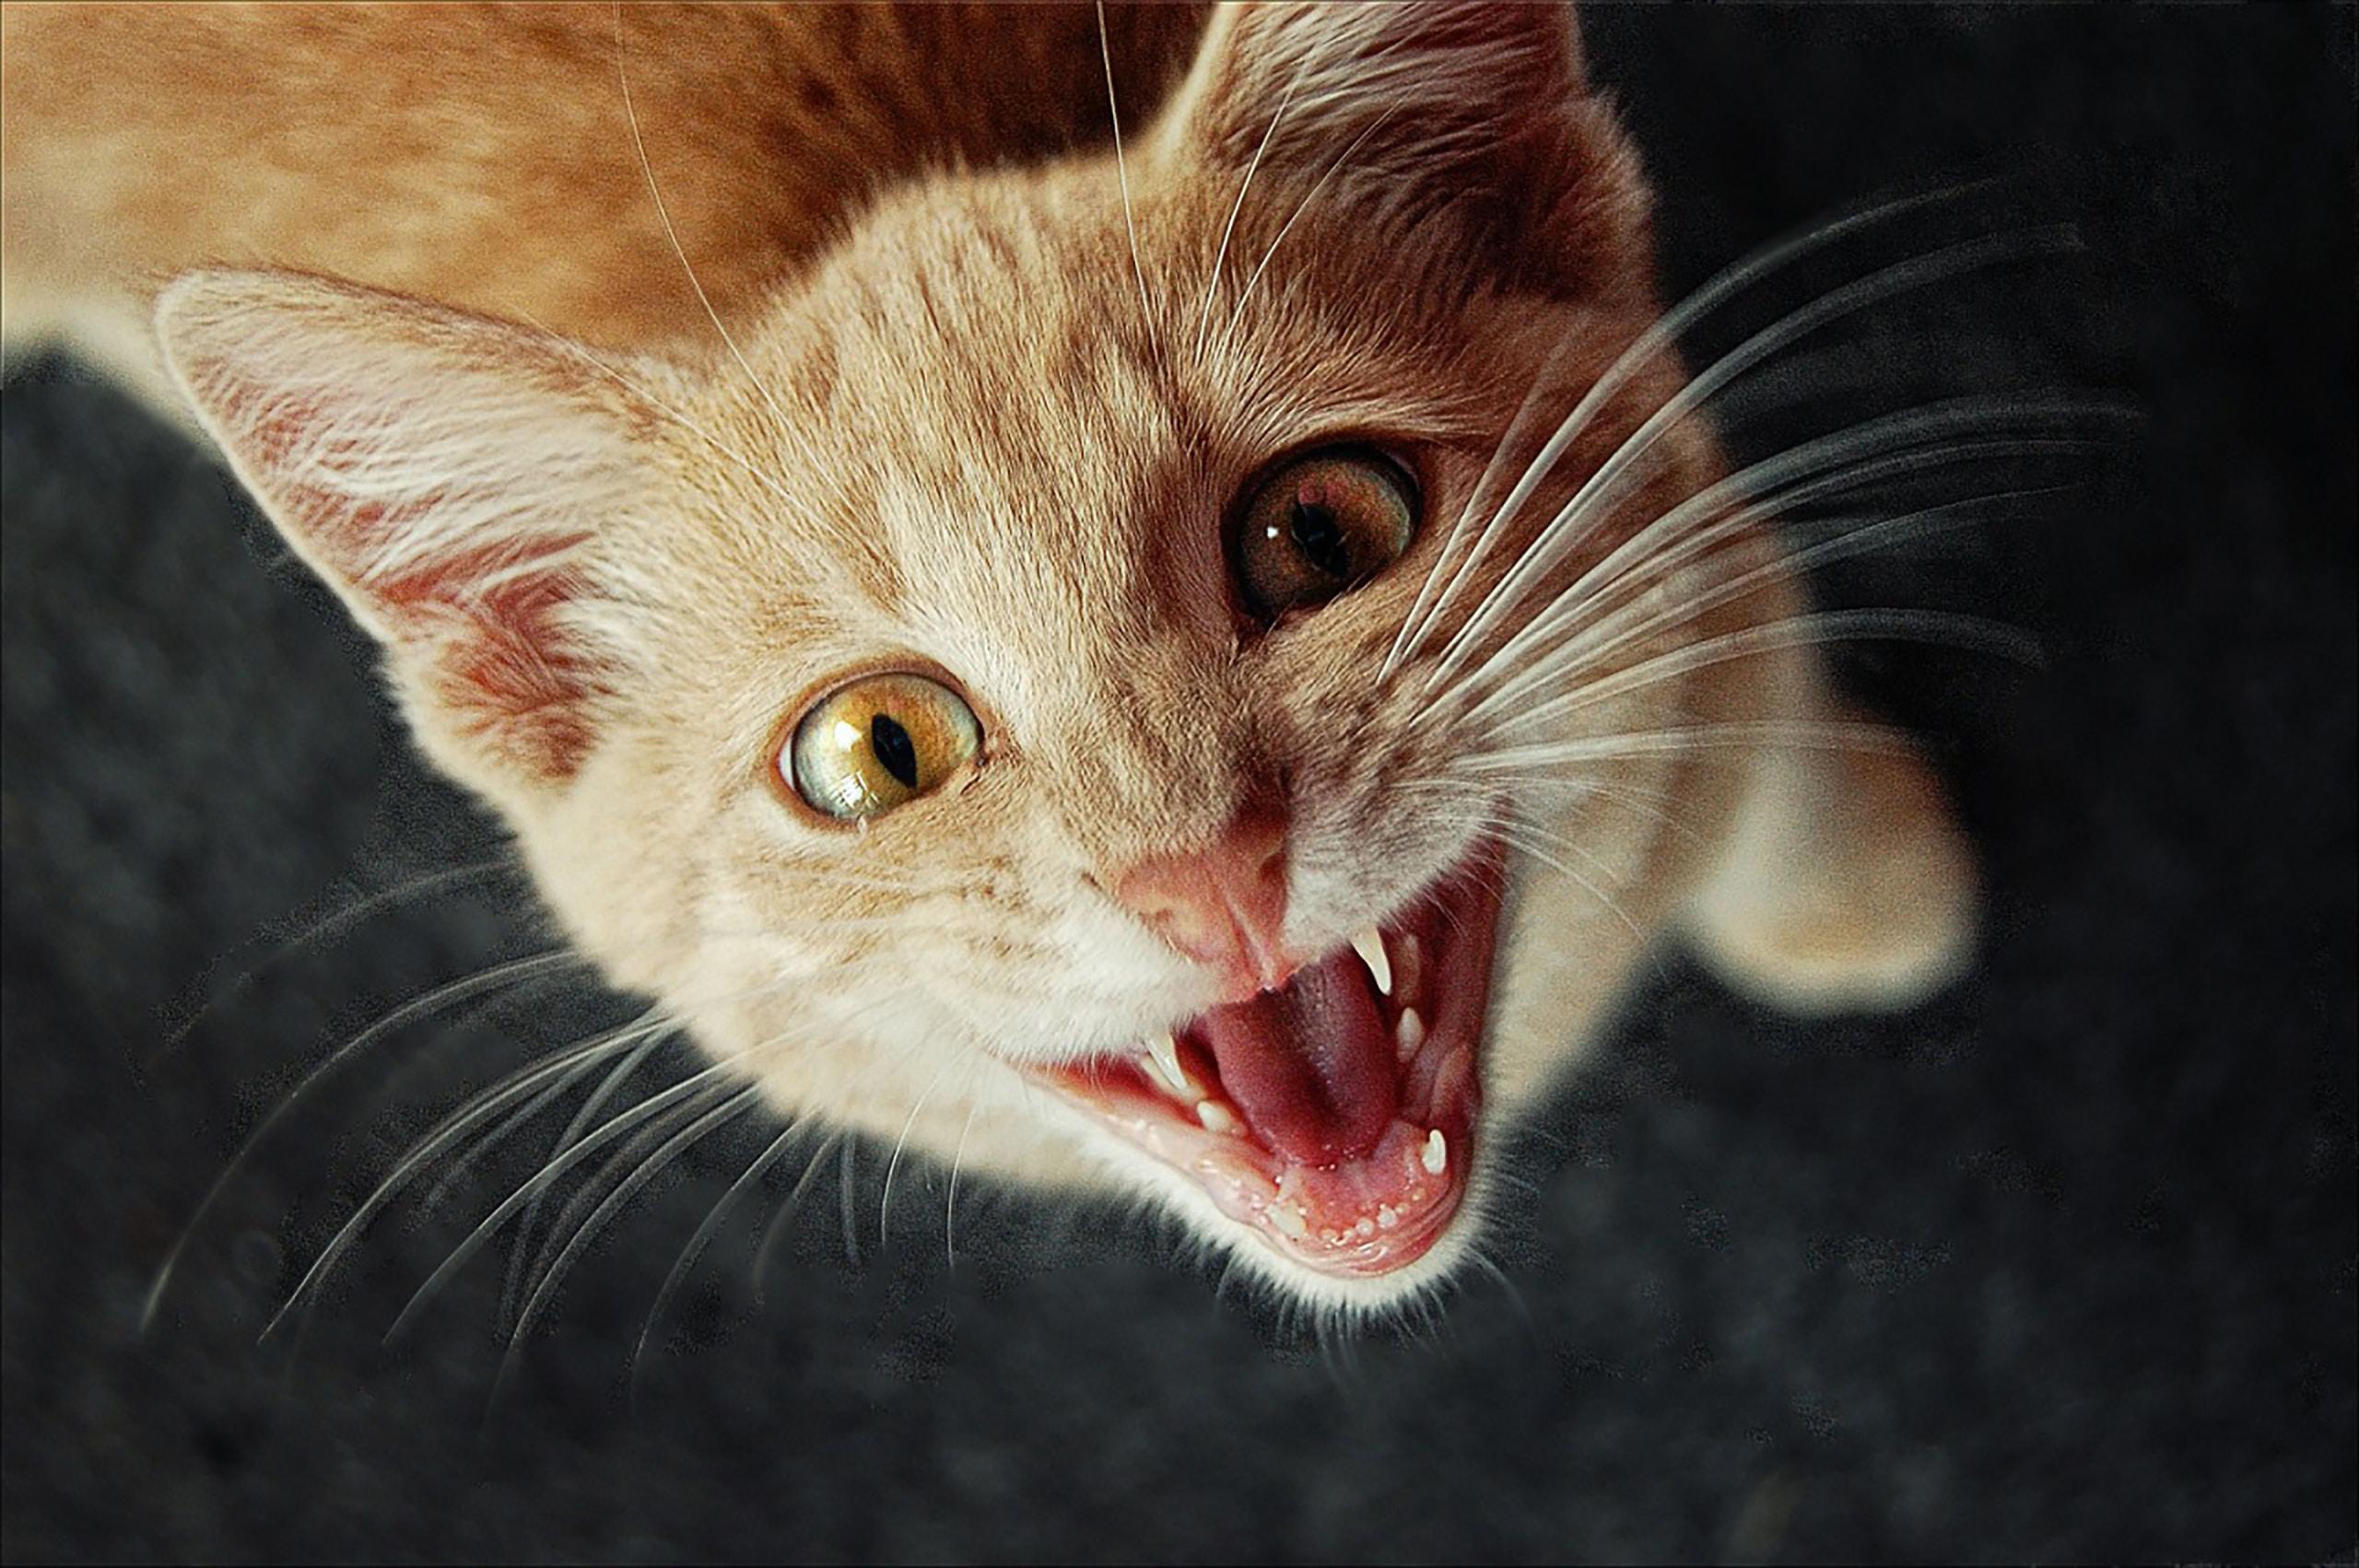 focus photography of orange tabby cat